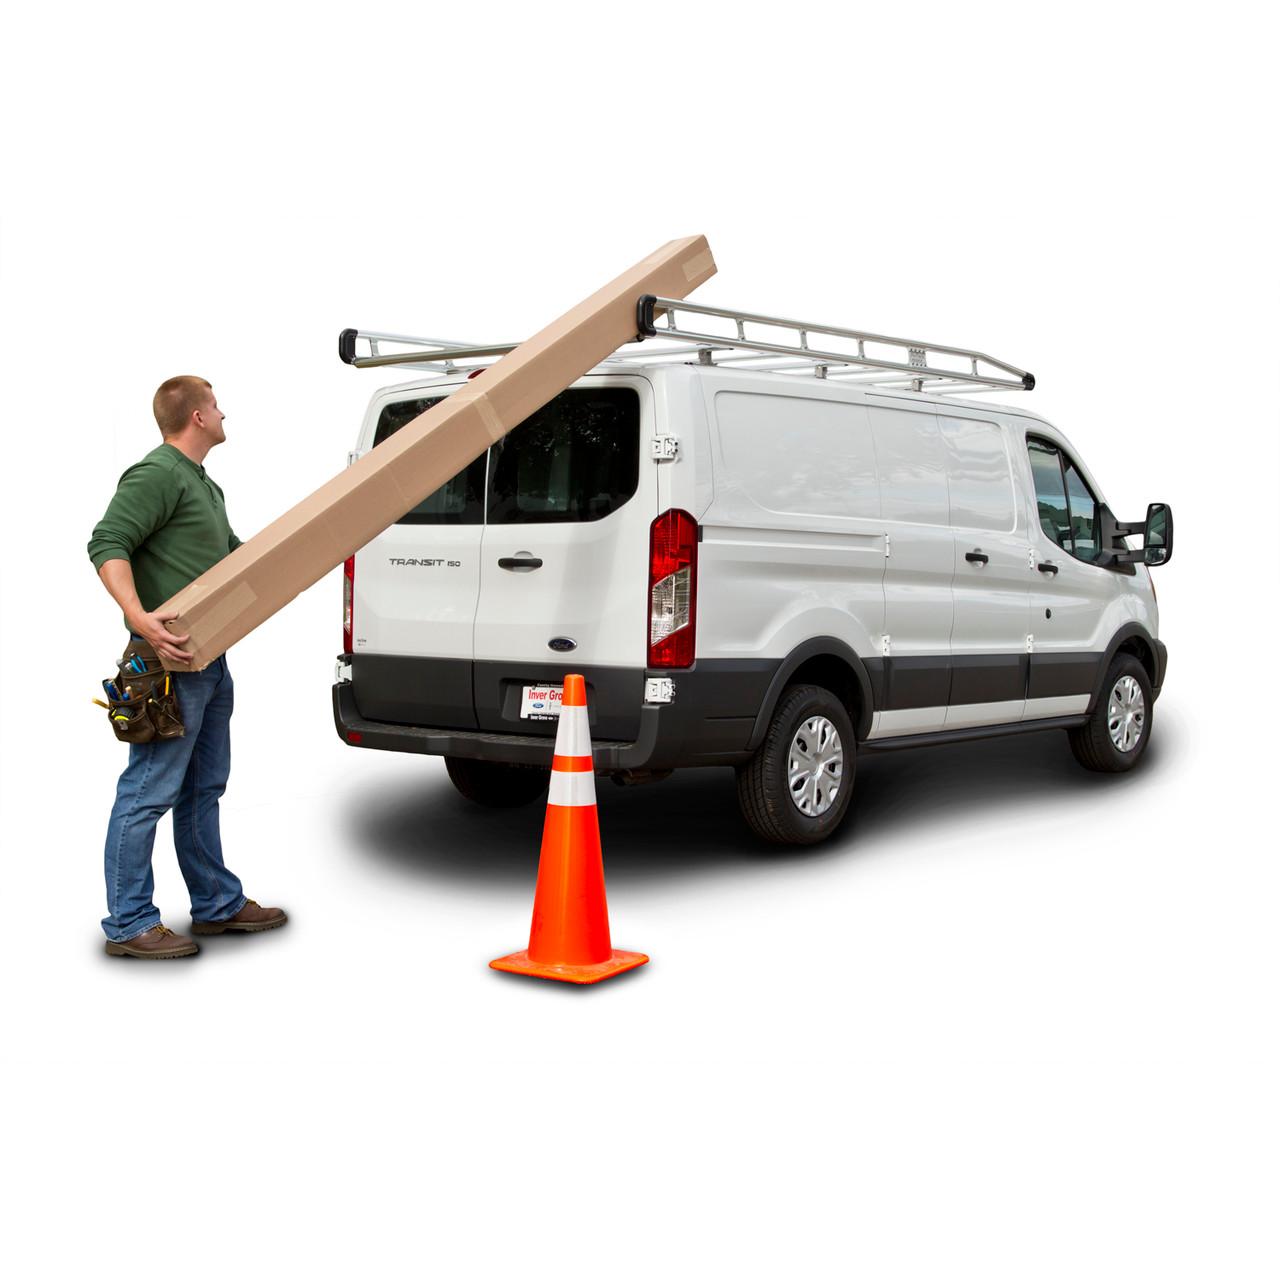 prime design ar1910 ladder rack for ford transit 130 wb mid roof